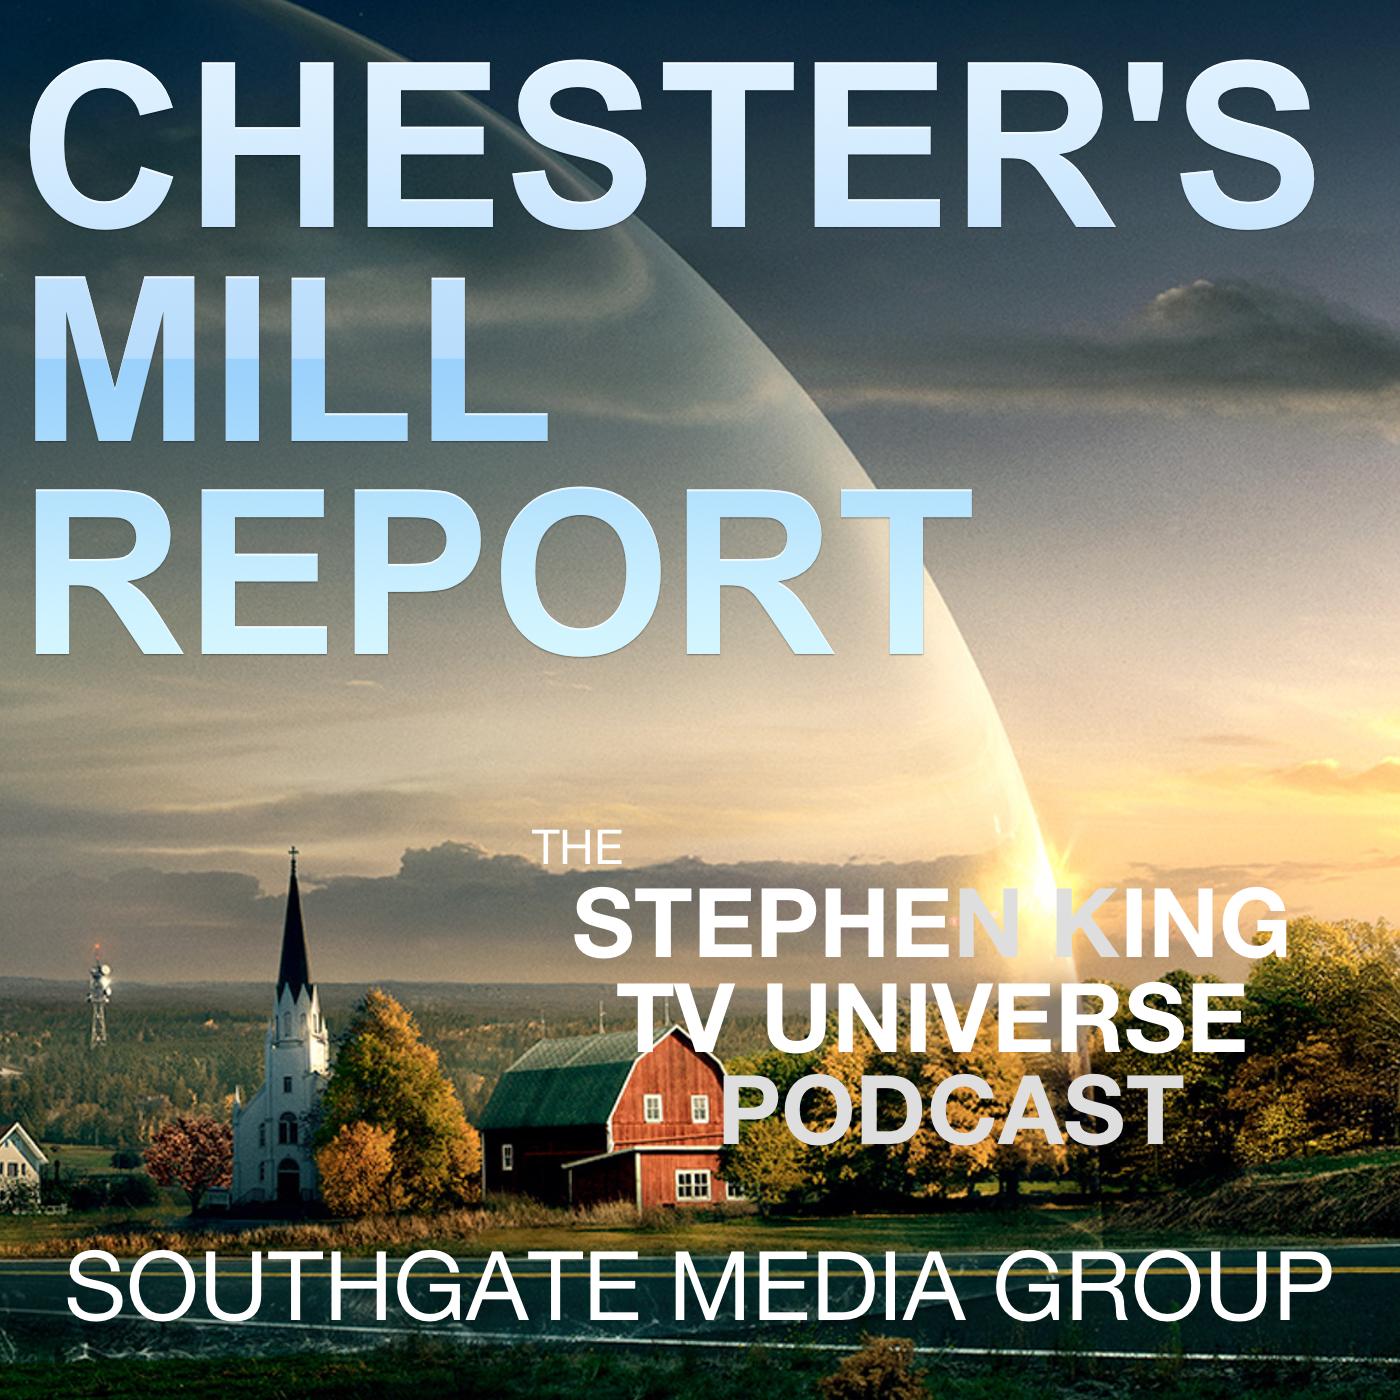 CHesters Mill logo 3 1400x14300.jpg